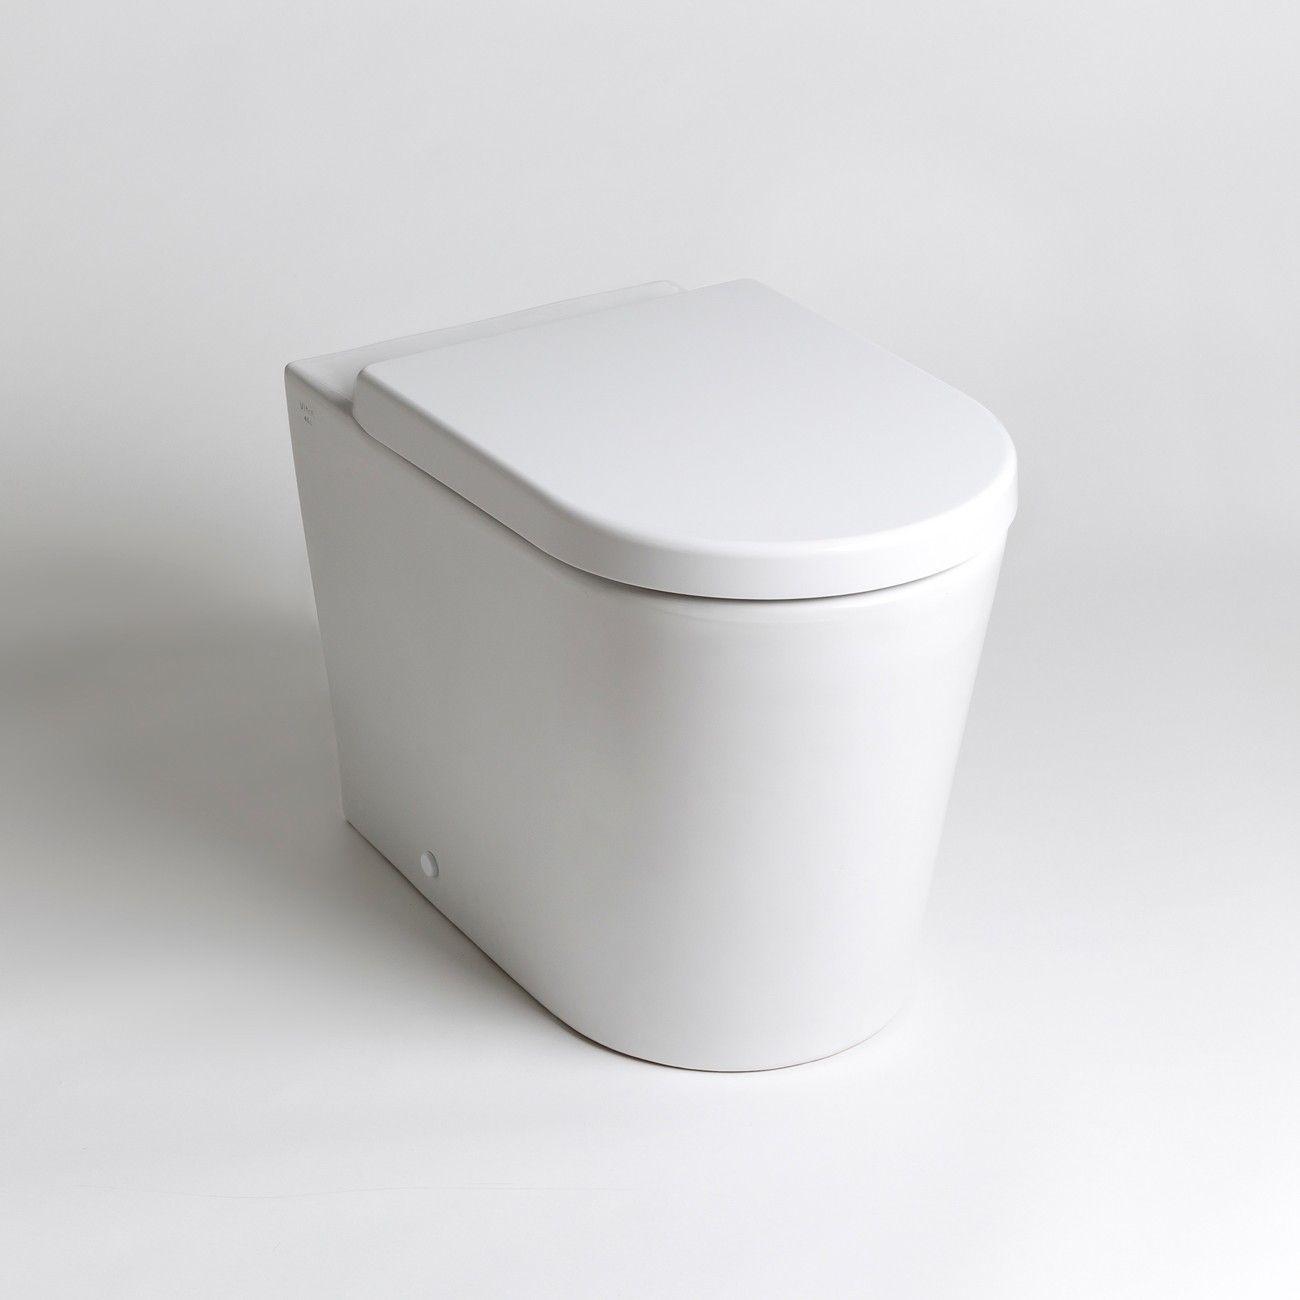 Pleasing Pin By Lulu Graubart On Bathroom Toilet Downstairs Toilet Uwap Interior Chair Design Uwaporg